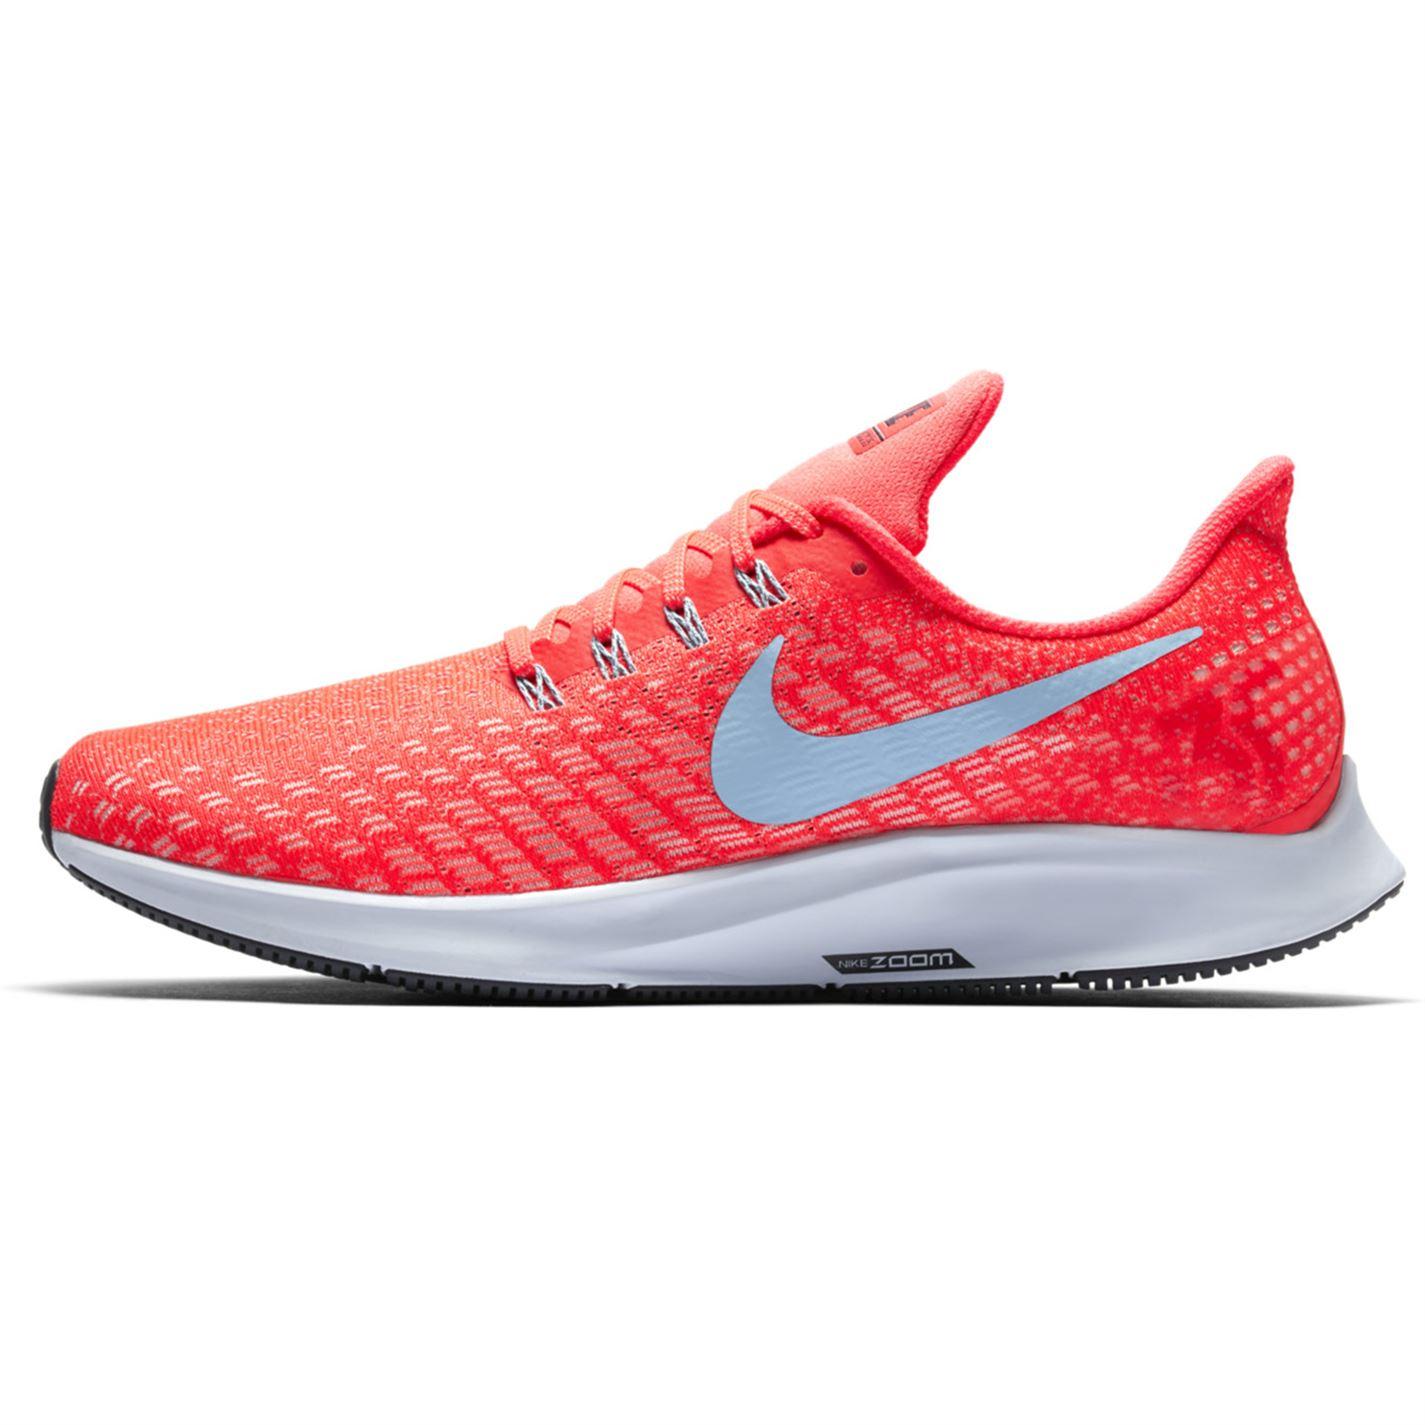 Nike Air Zoom Pegasus 35 Pánské běžecké boty - Glami.sk 569308d1b15